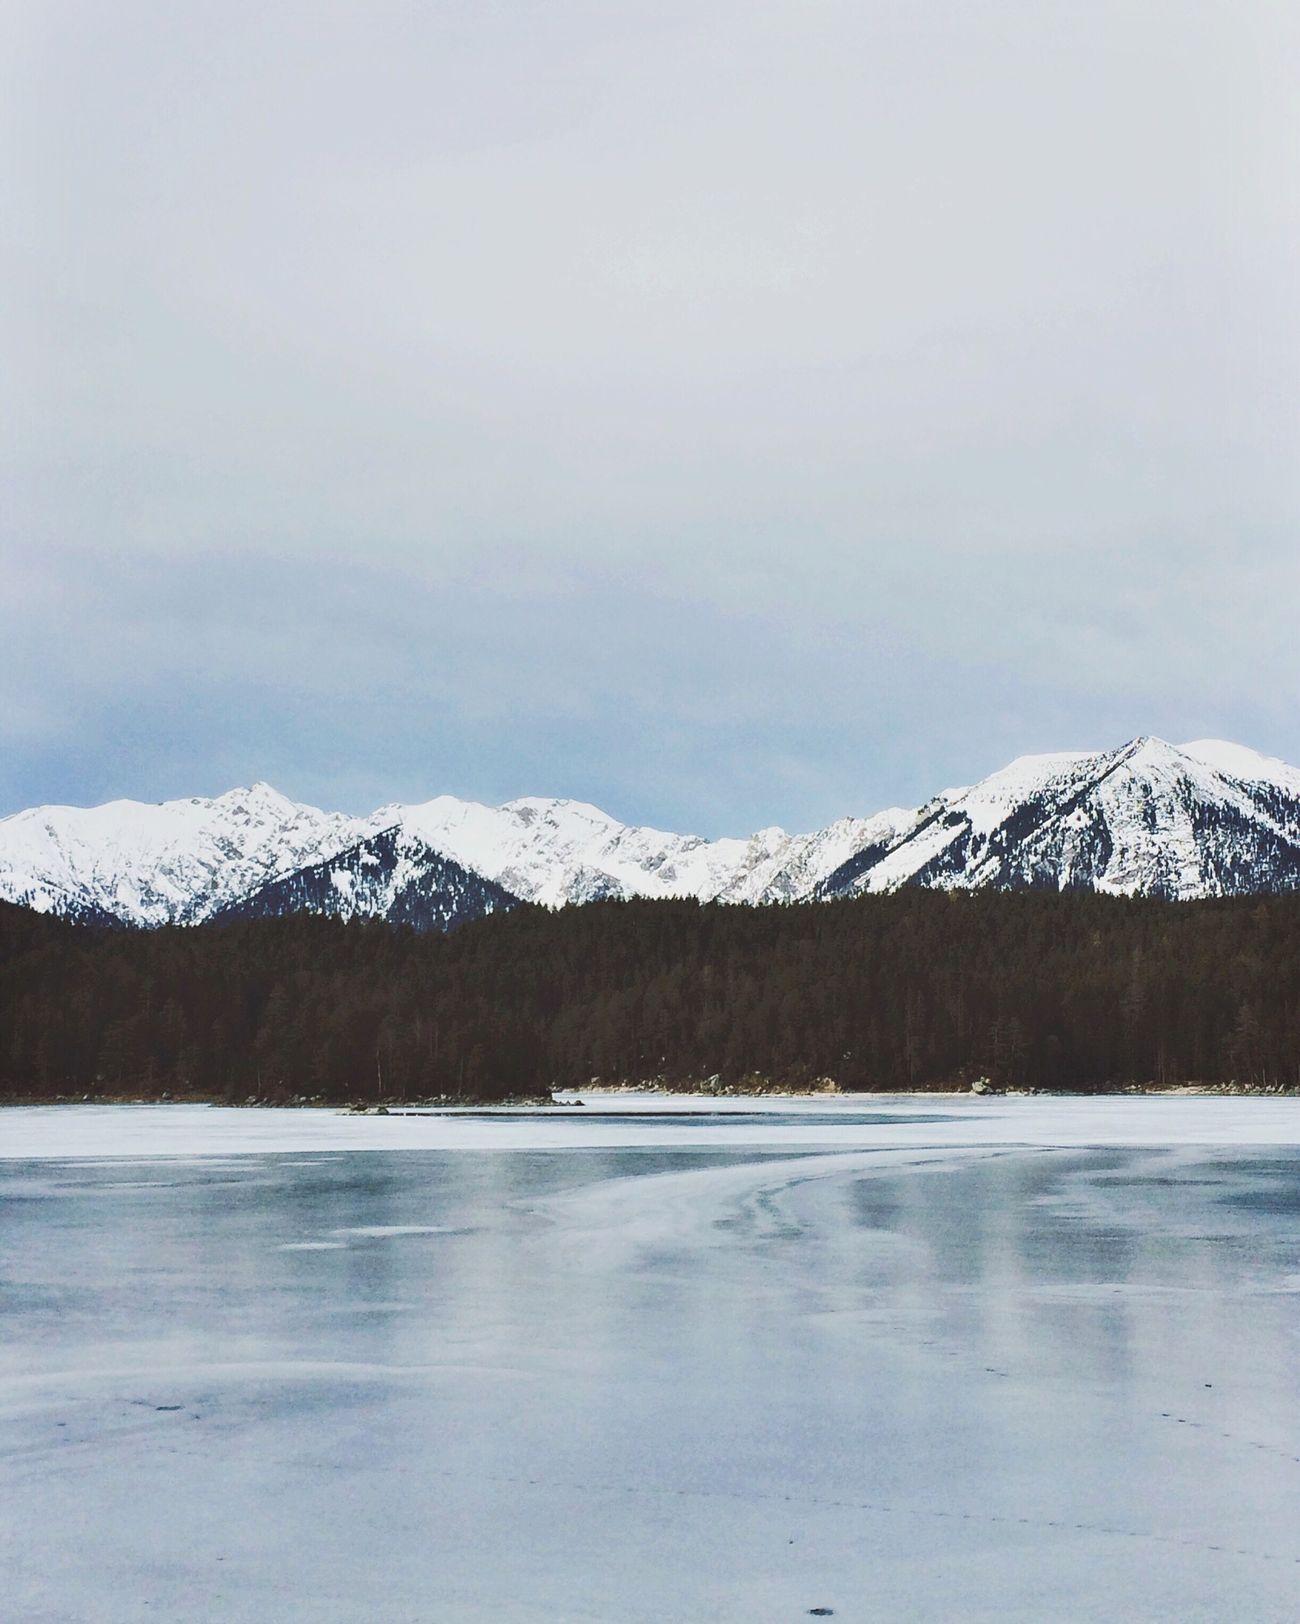 Still winter. The Week Of Eyeem IPhoneography Ice Winter EyeEm Best Shots - Nature Eibsee Winter Wonderland Bavarian Alps Naturelovers Lake Wintertime Bavaria Snow Mountains And Sky